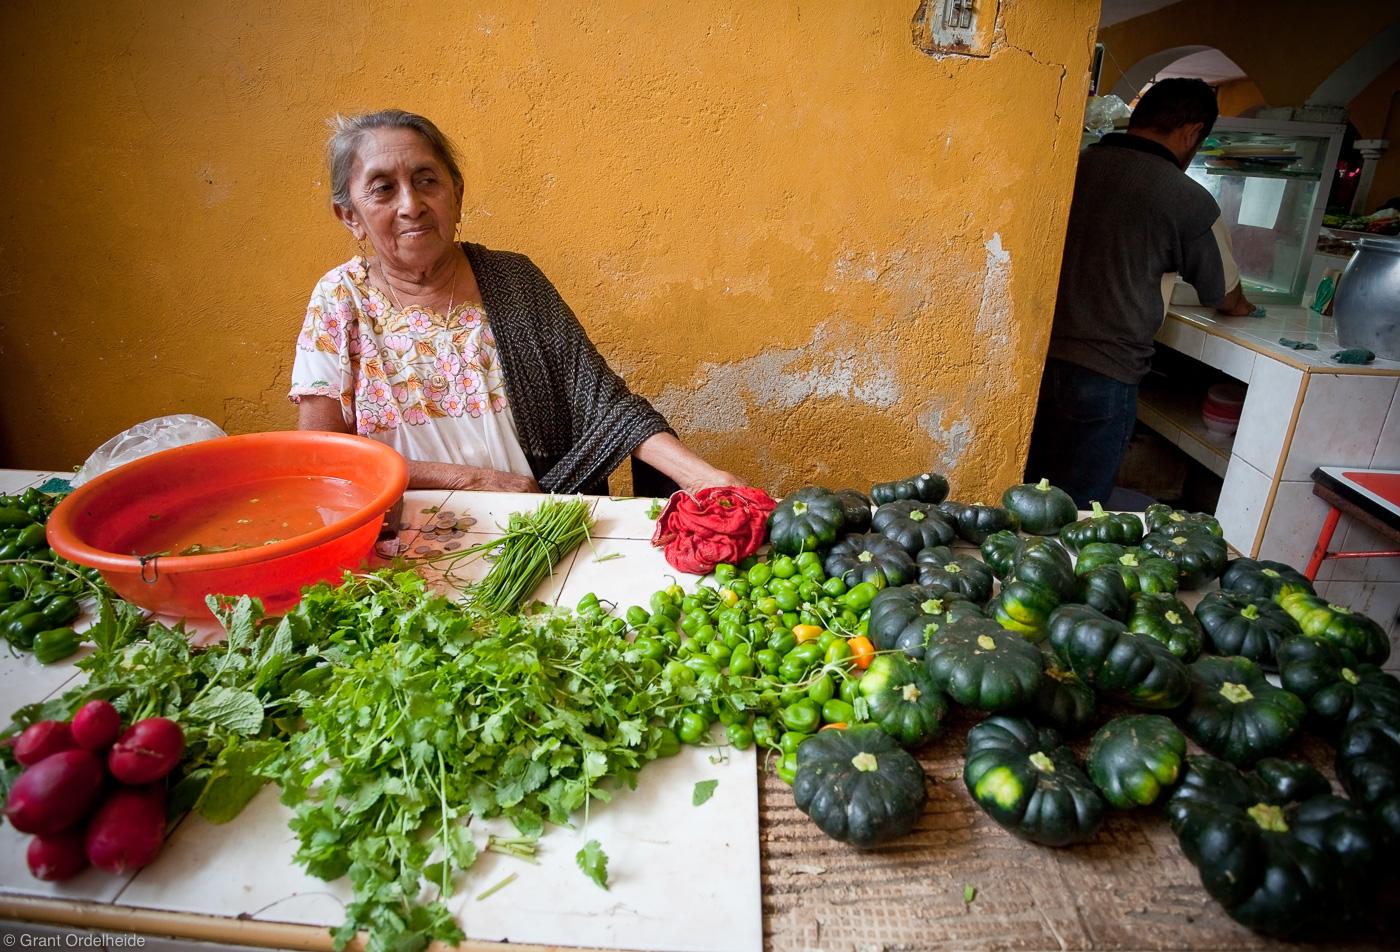 woman, vegetables, izamal, yucatan, mexico, town market, chops, photo